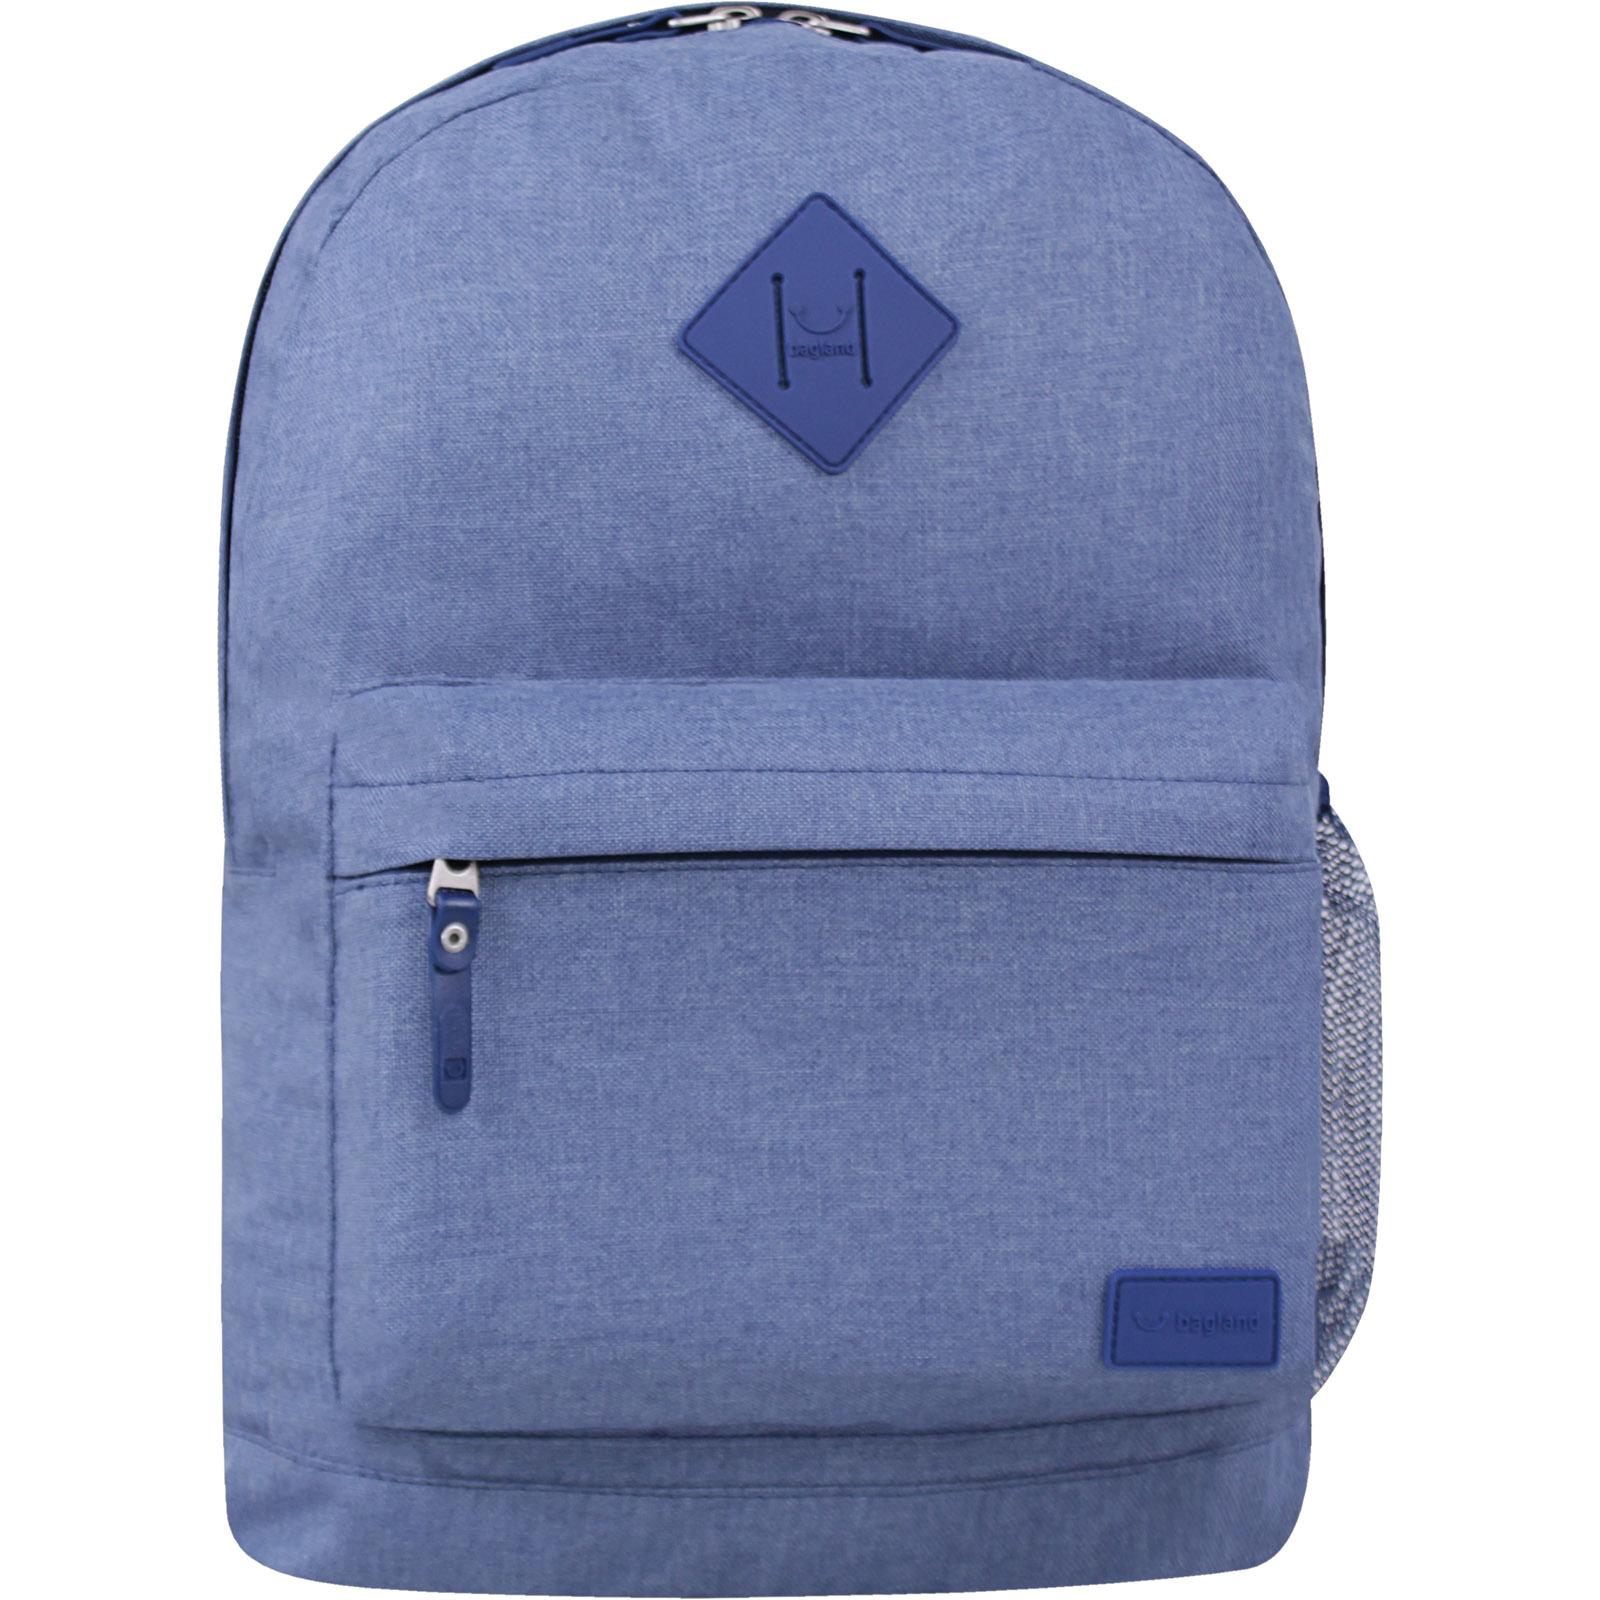 Рюкзак Bagland Молодежный меланж 17 л. Синий (00533692)